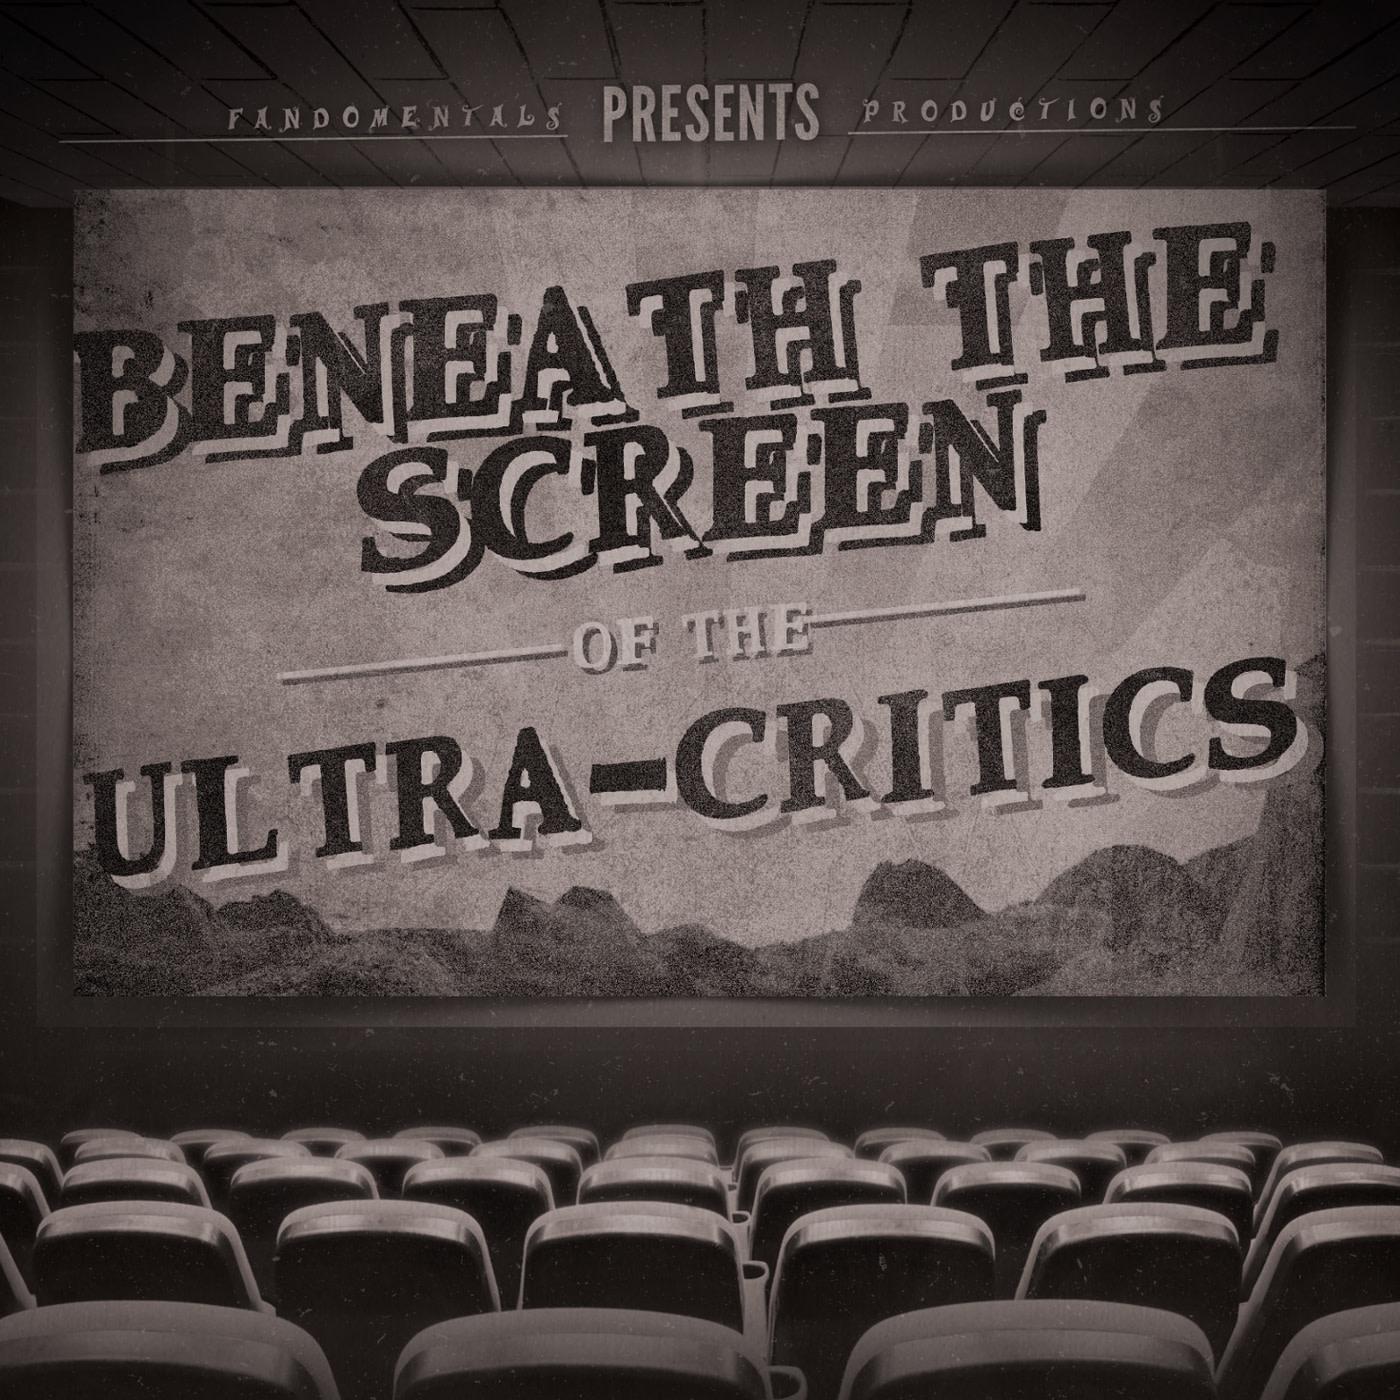 Show artwork for Beneath the Screen of the Ultra-Critics